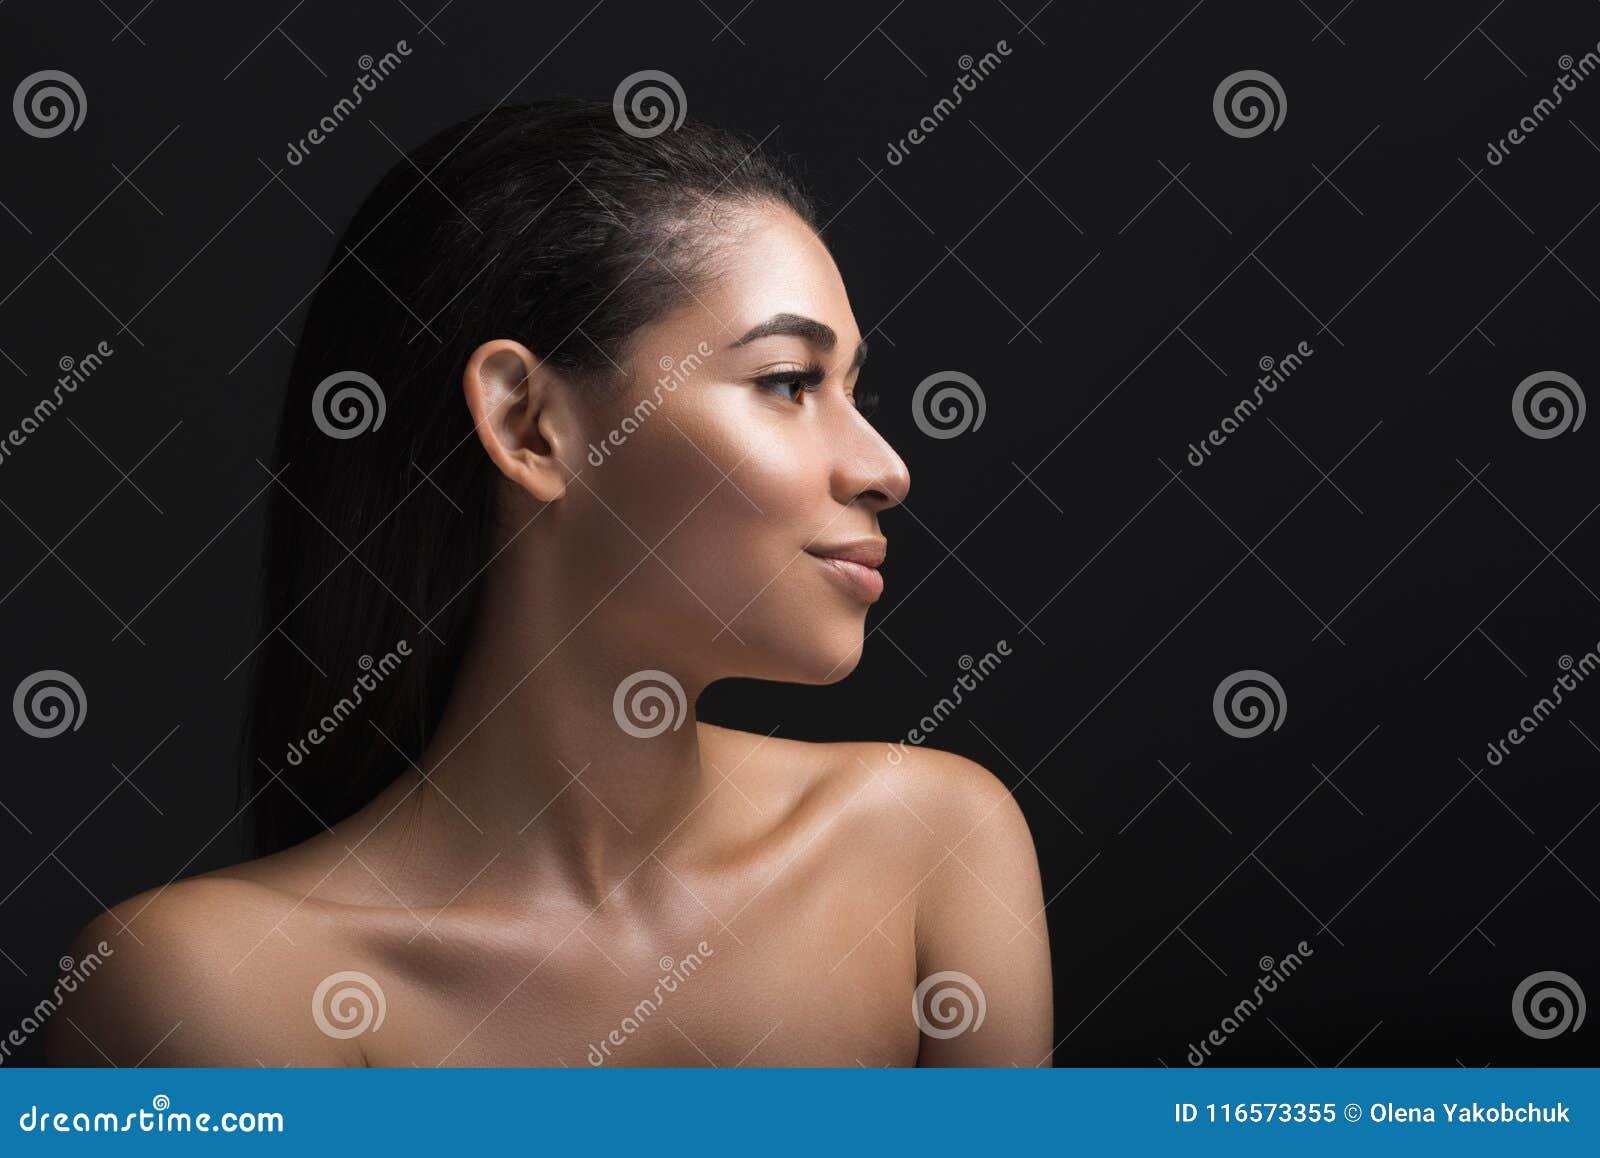 Picture doll sex porn